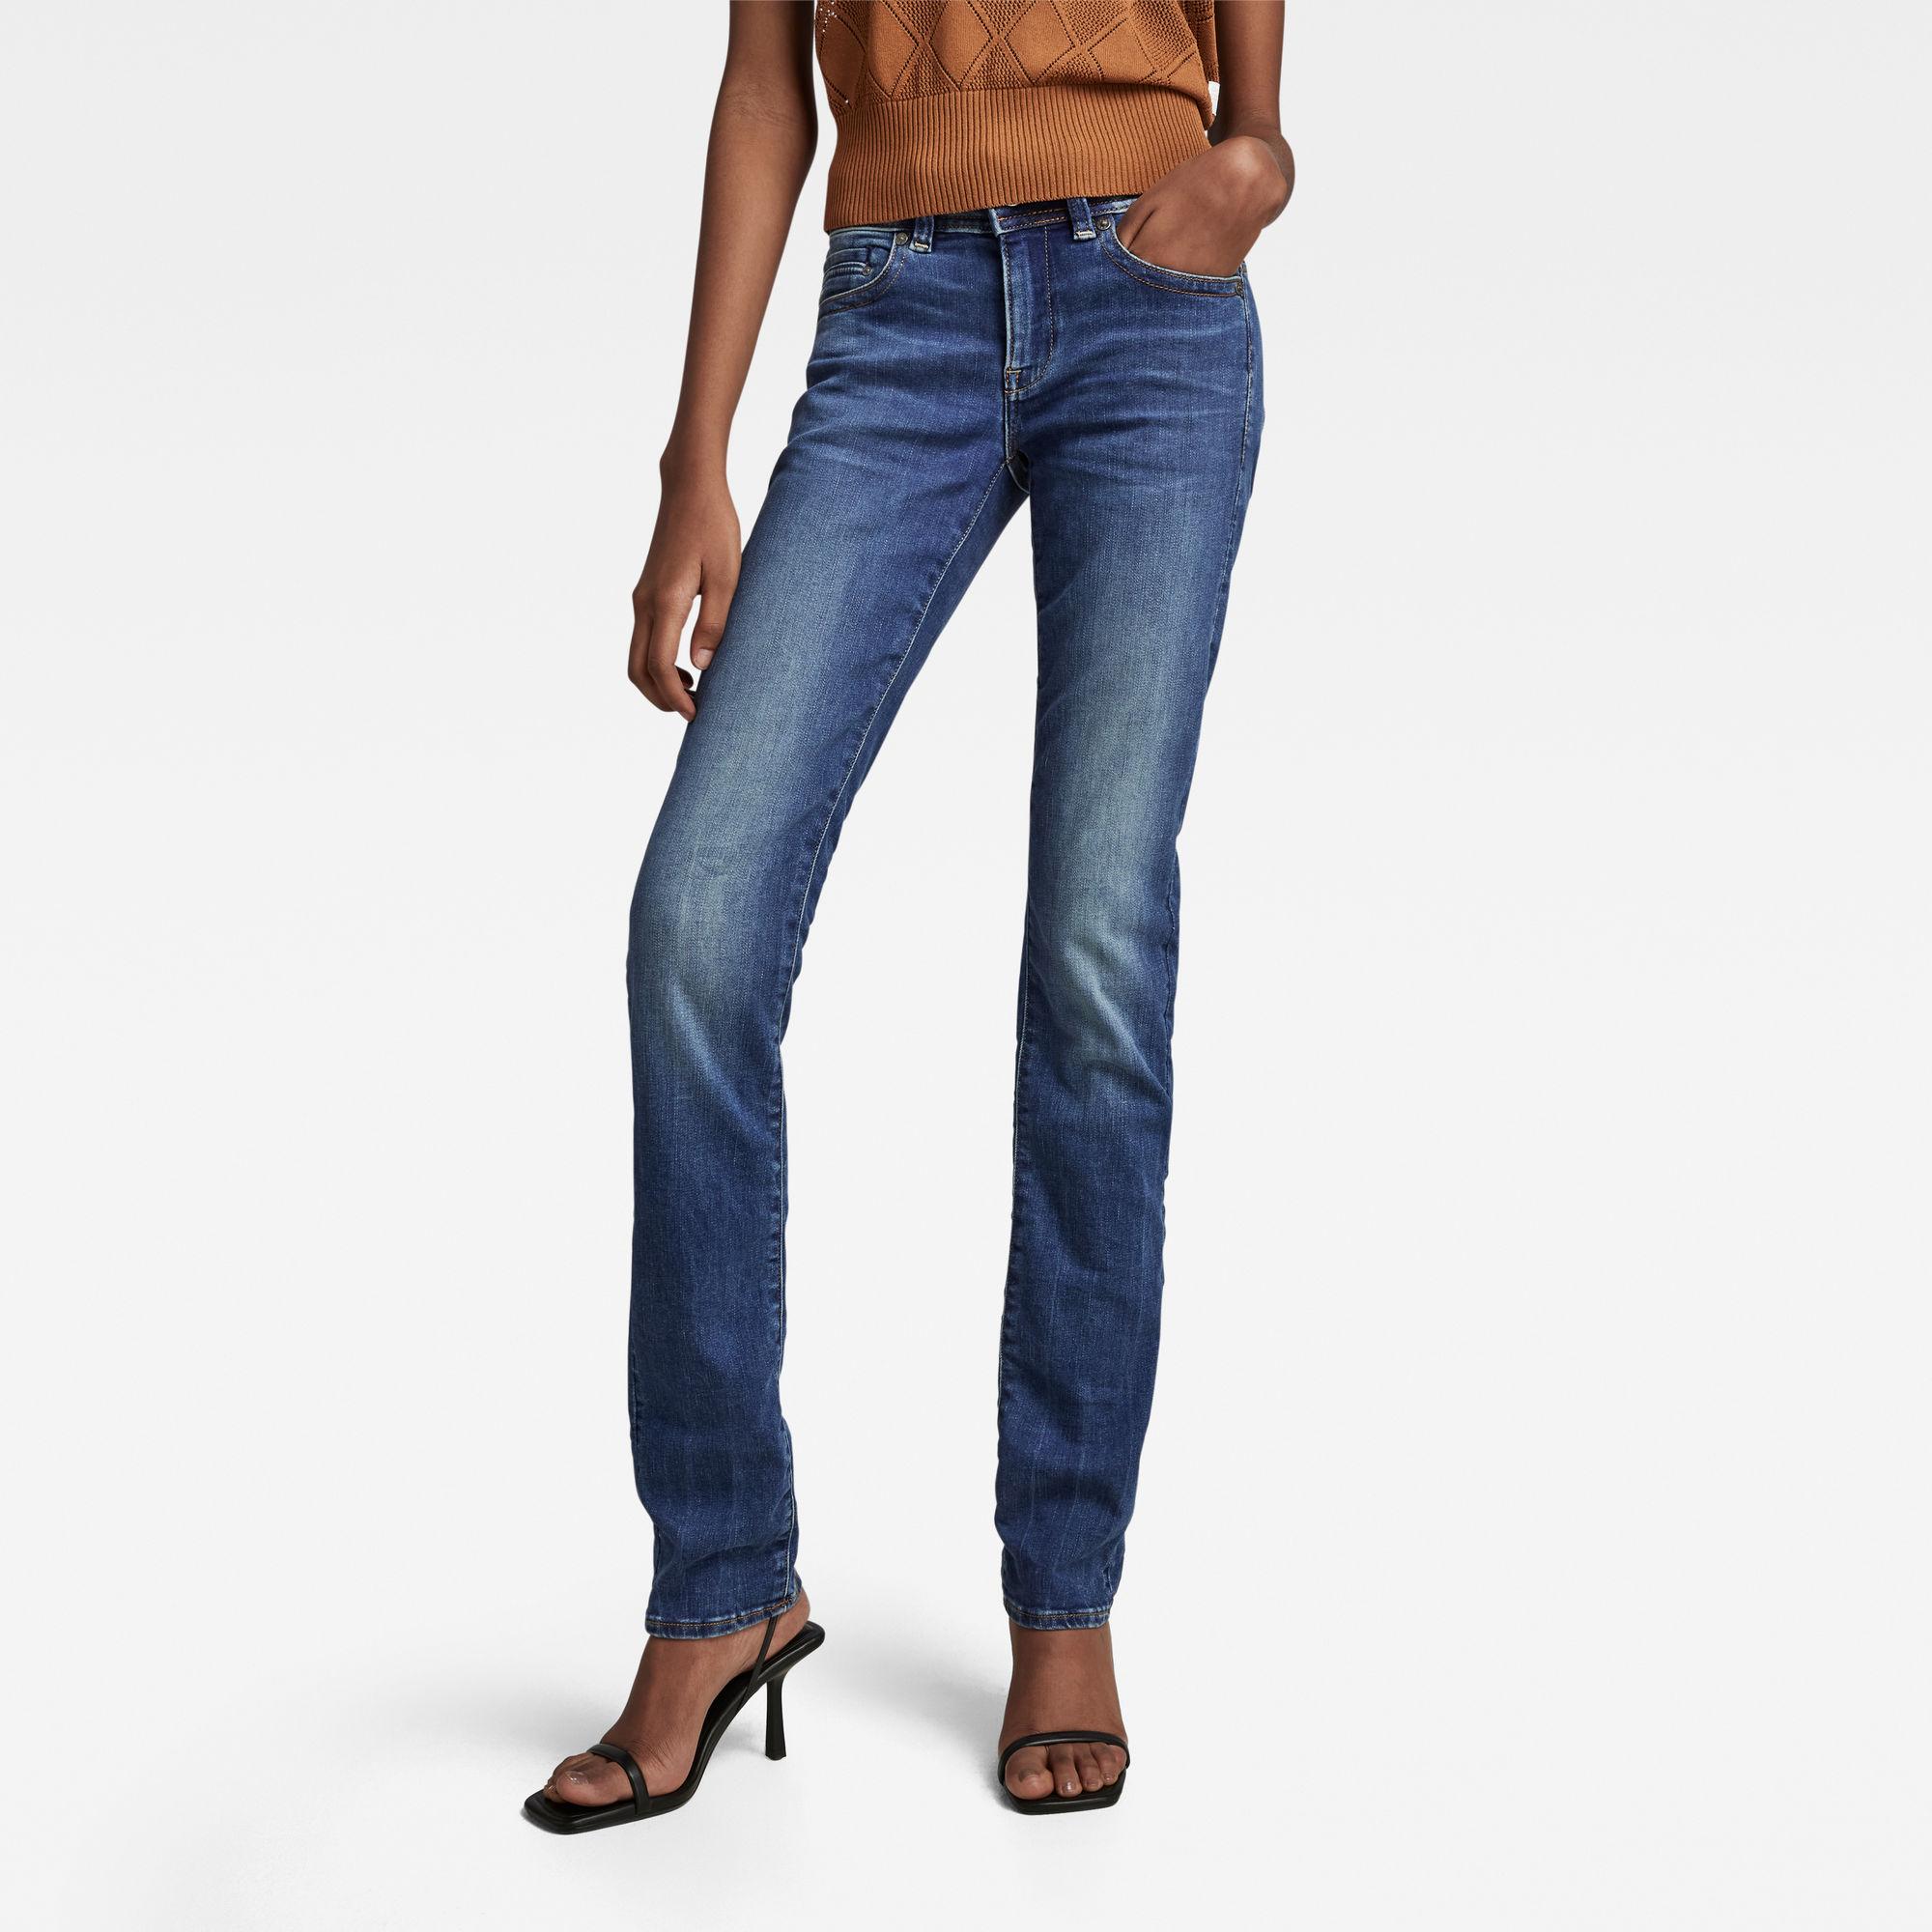 G-Star RAW Dames Midge Saddle Straight Jeans Blauw